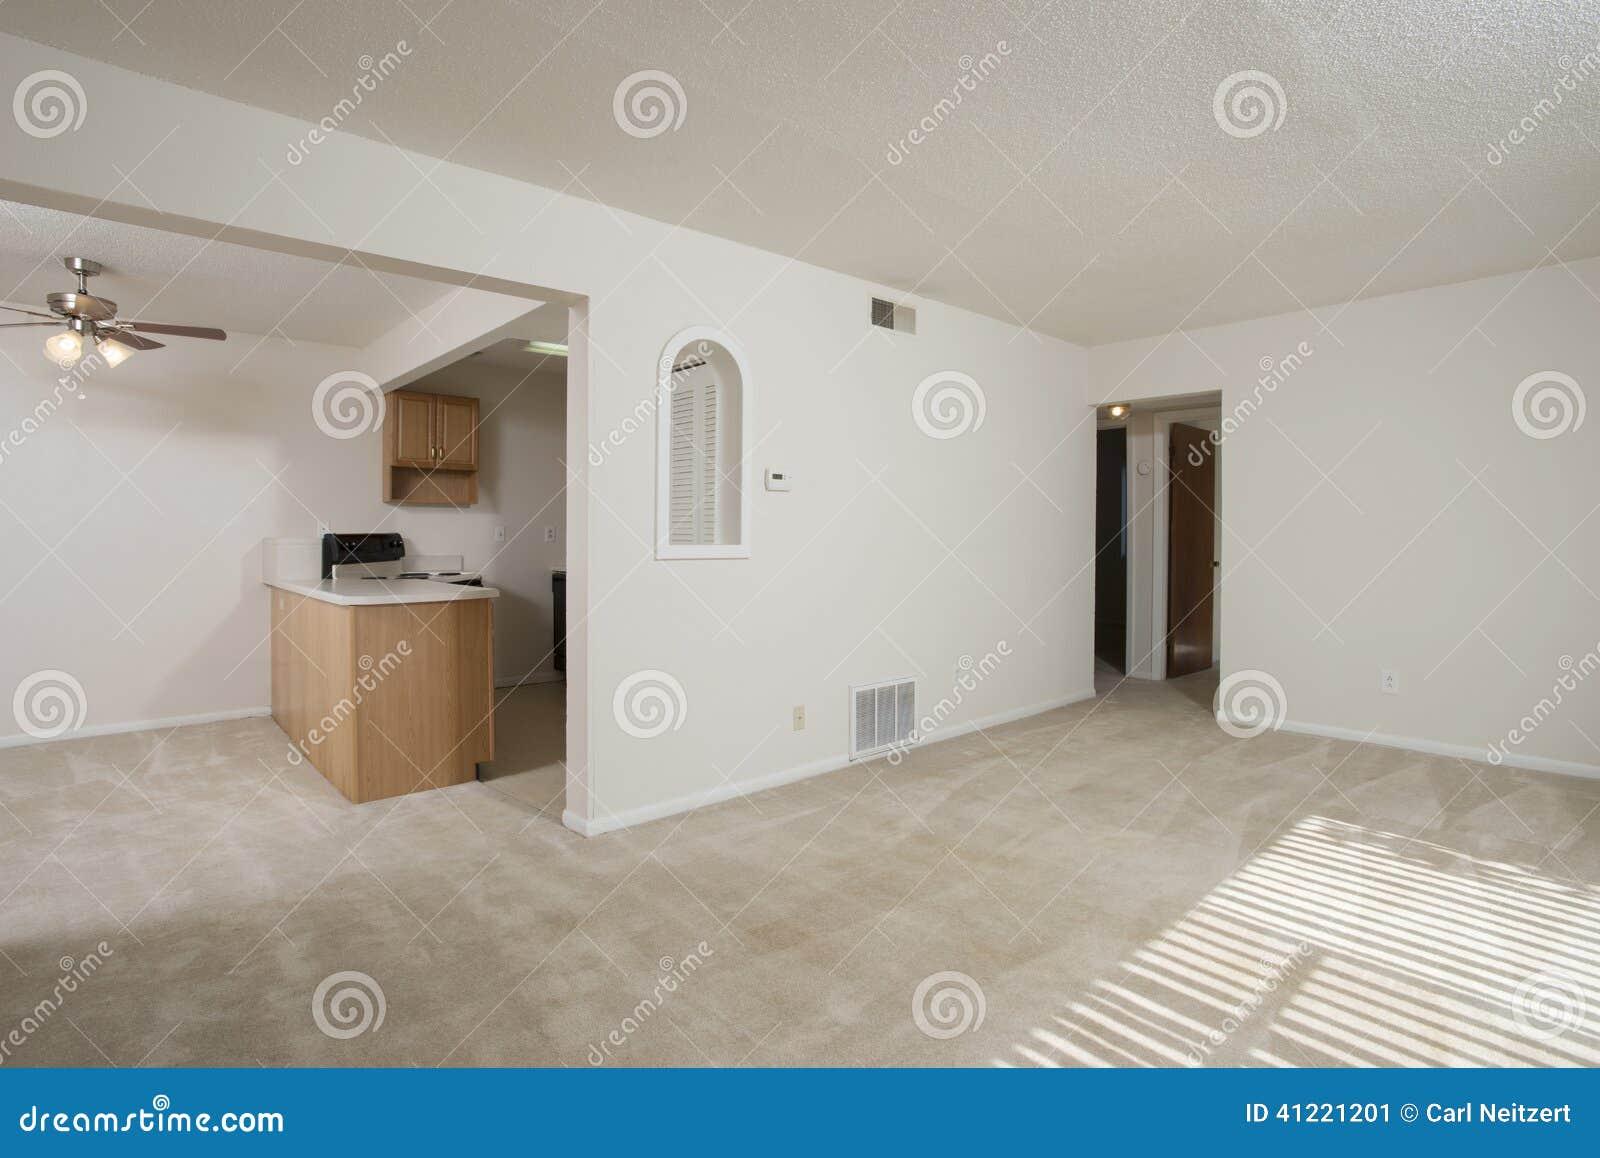 wonderful empty apartment living room | Small empty apartment stock image. Image of empty, small ...